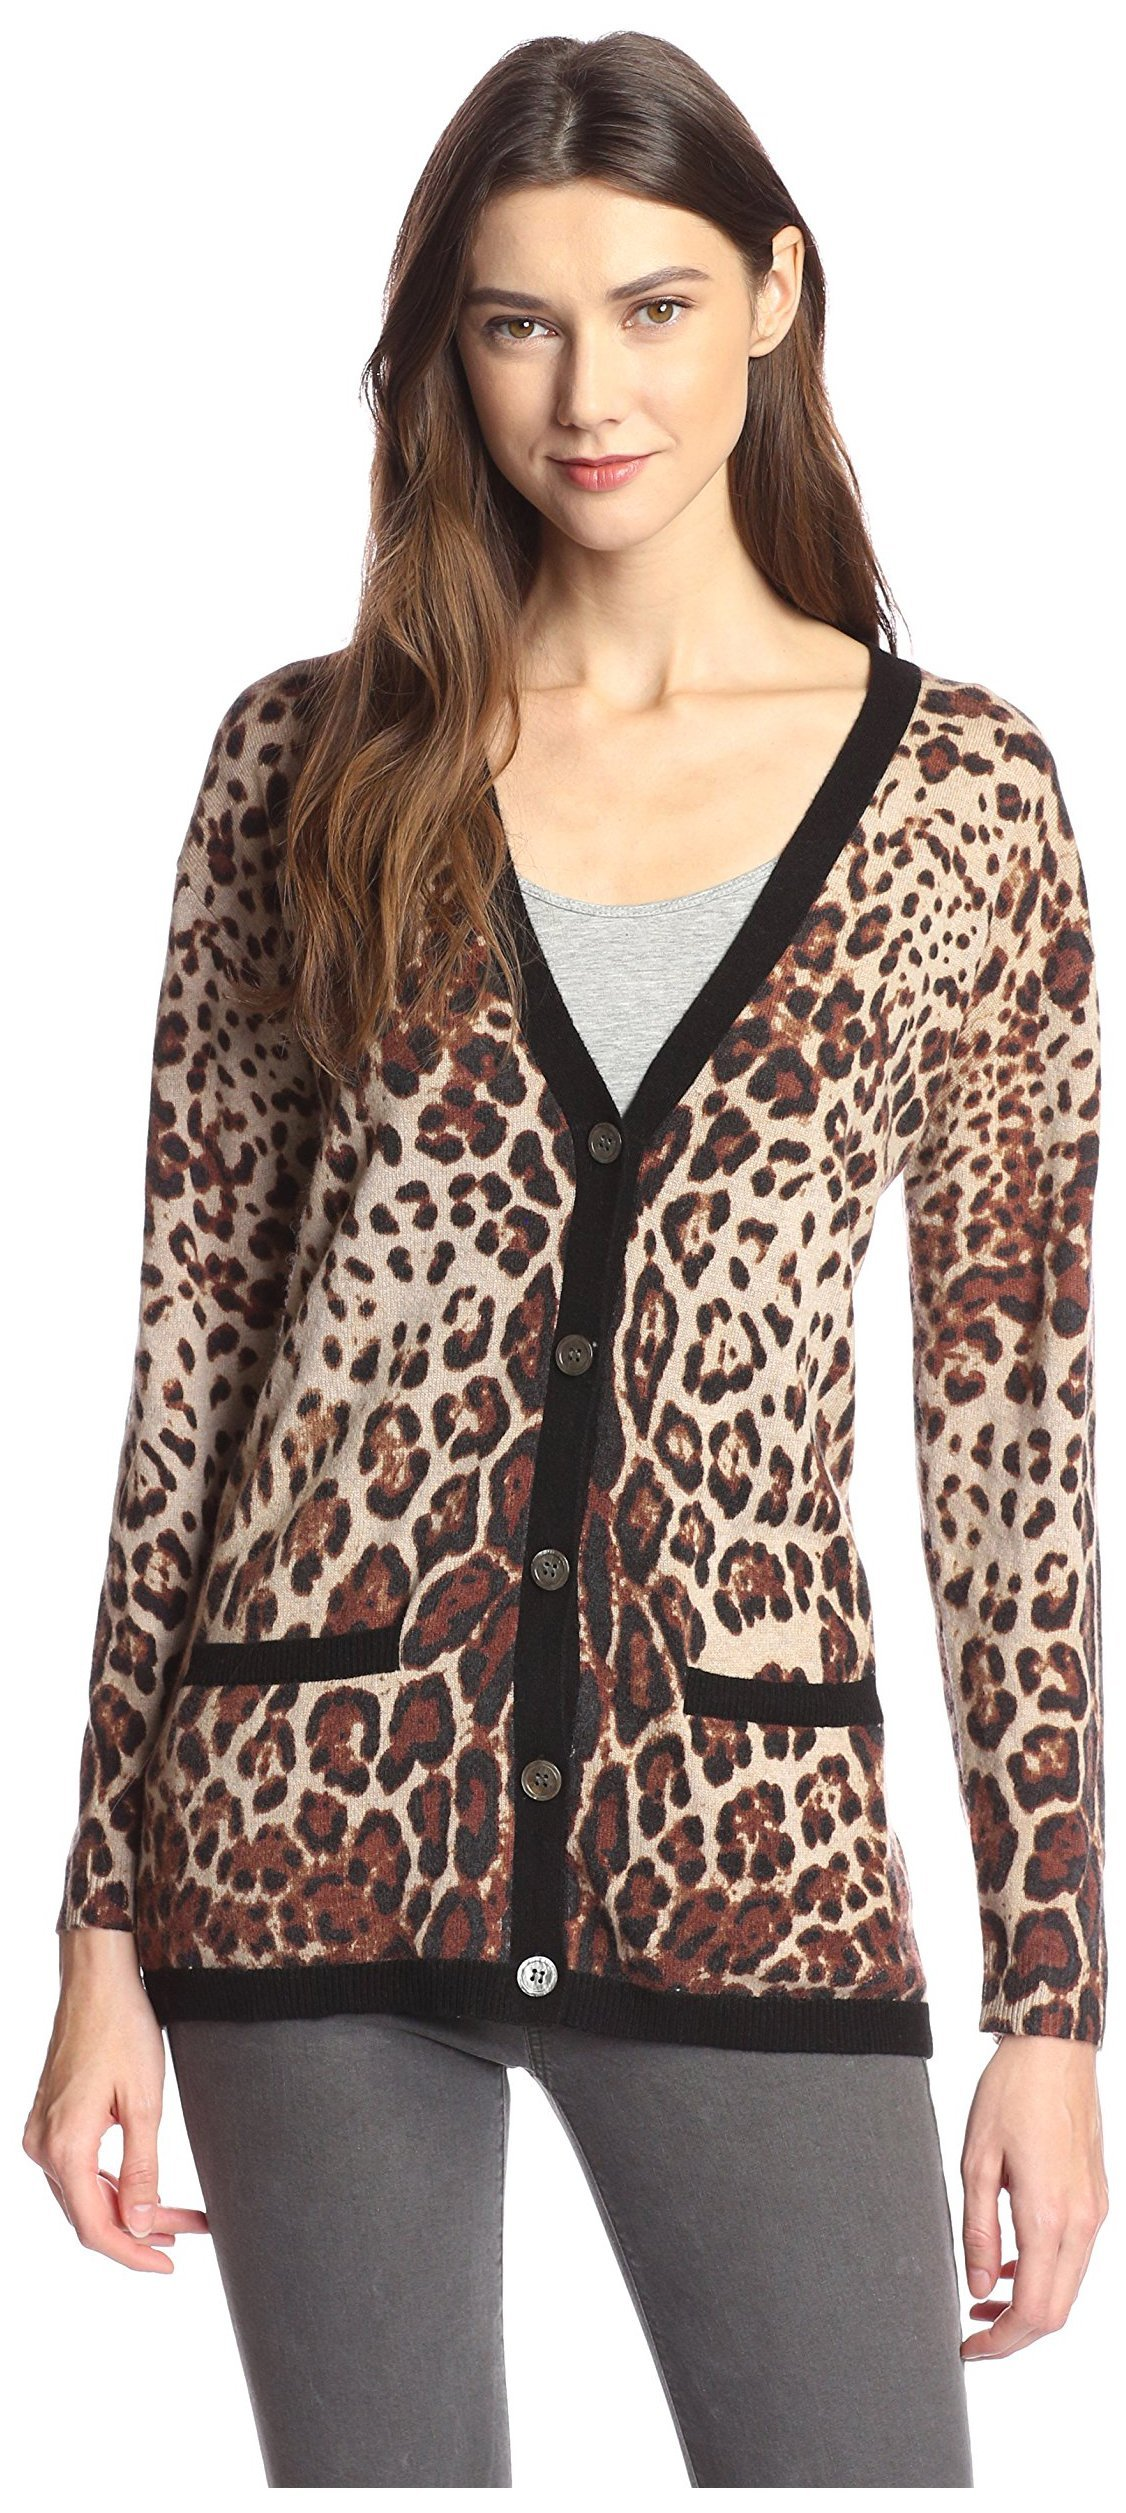 James & Erin Women's Cashmere Leopard Cardigan, Natural Multi, L